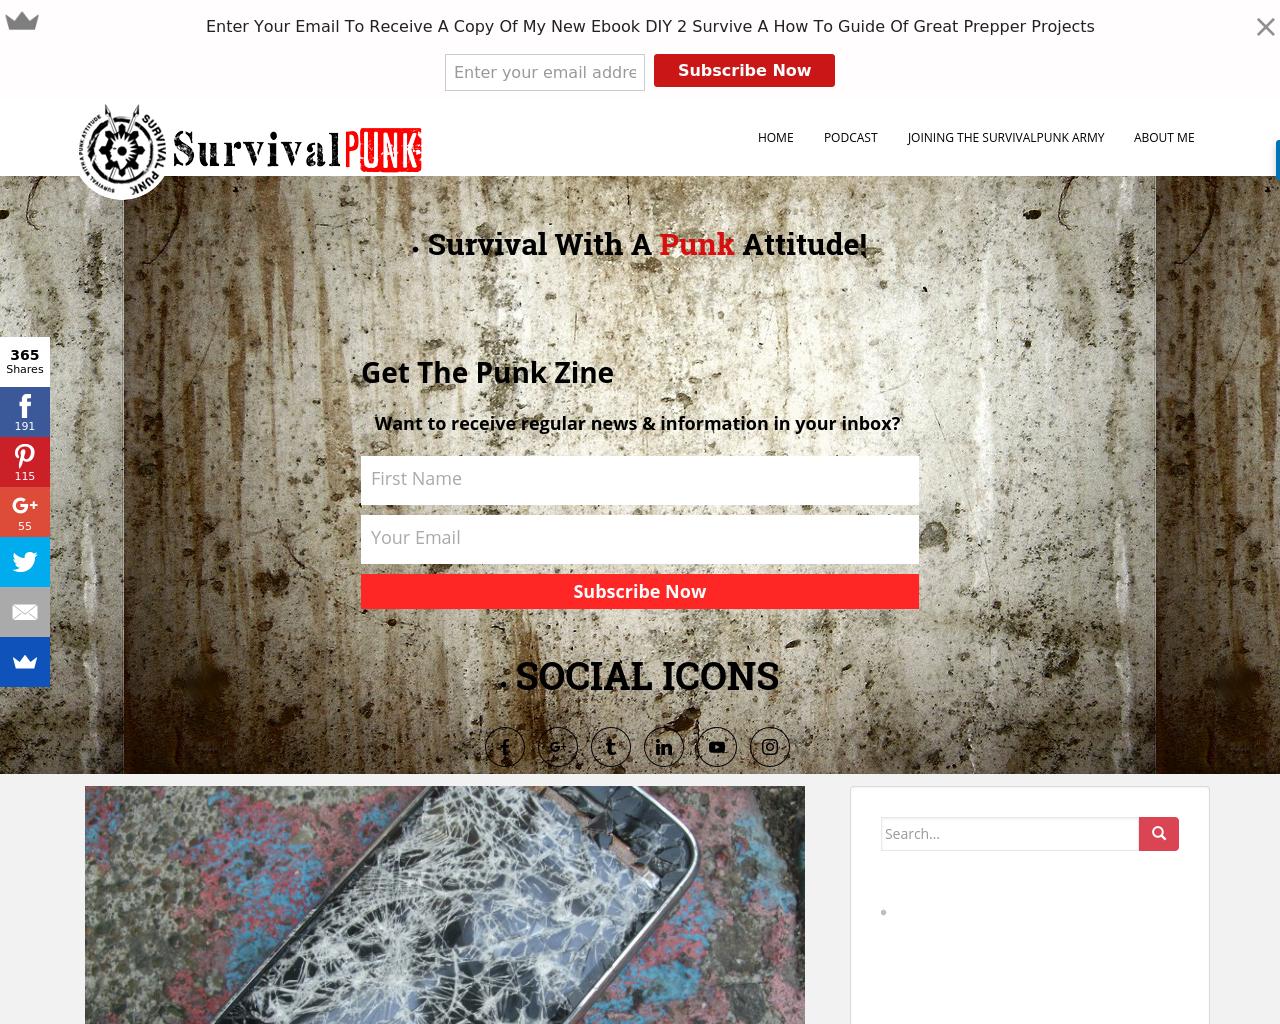 Survival-Punk-Advertising-Reviews-Pricing